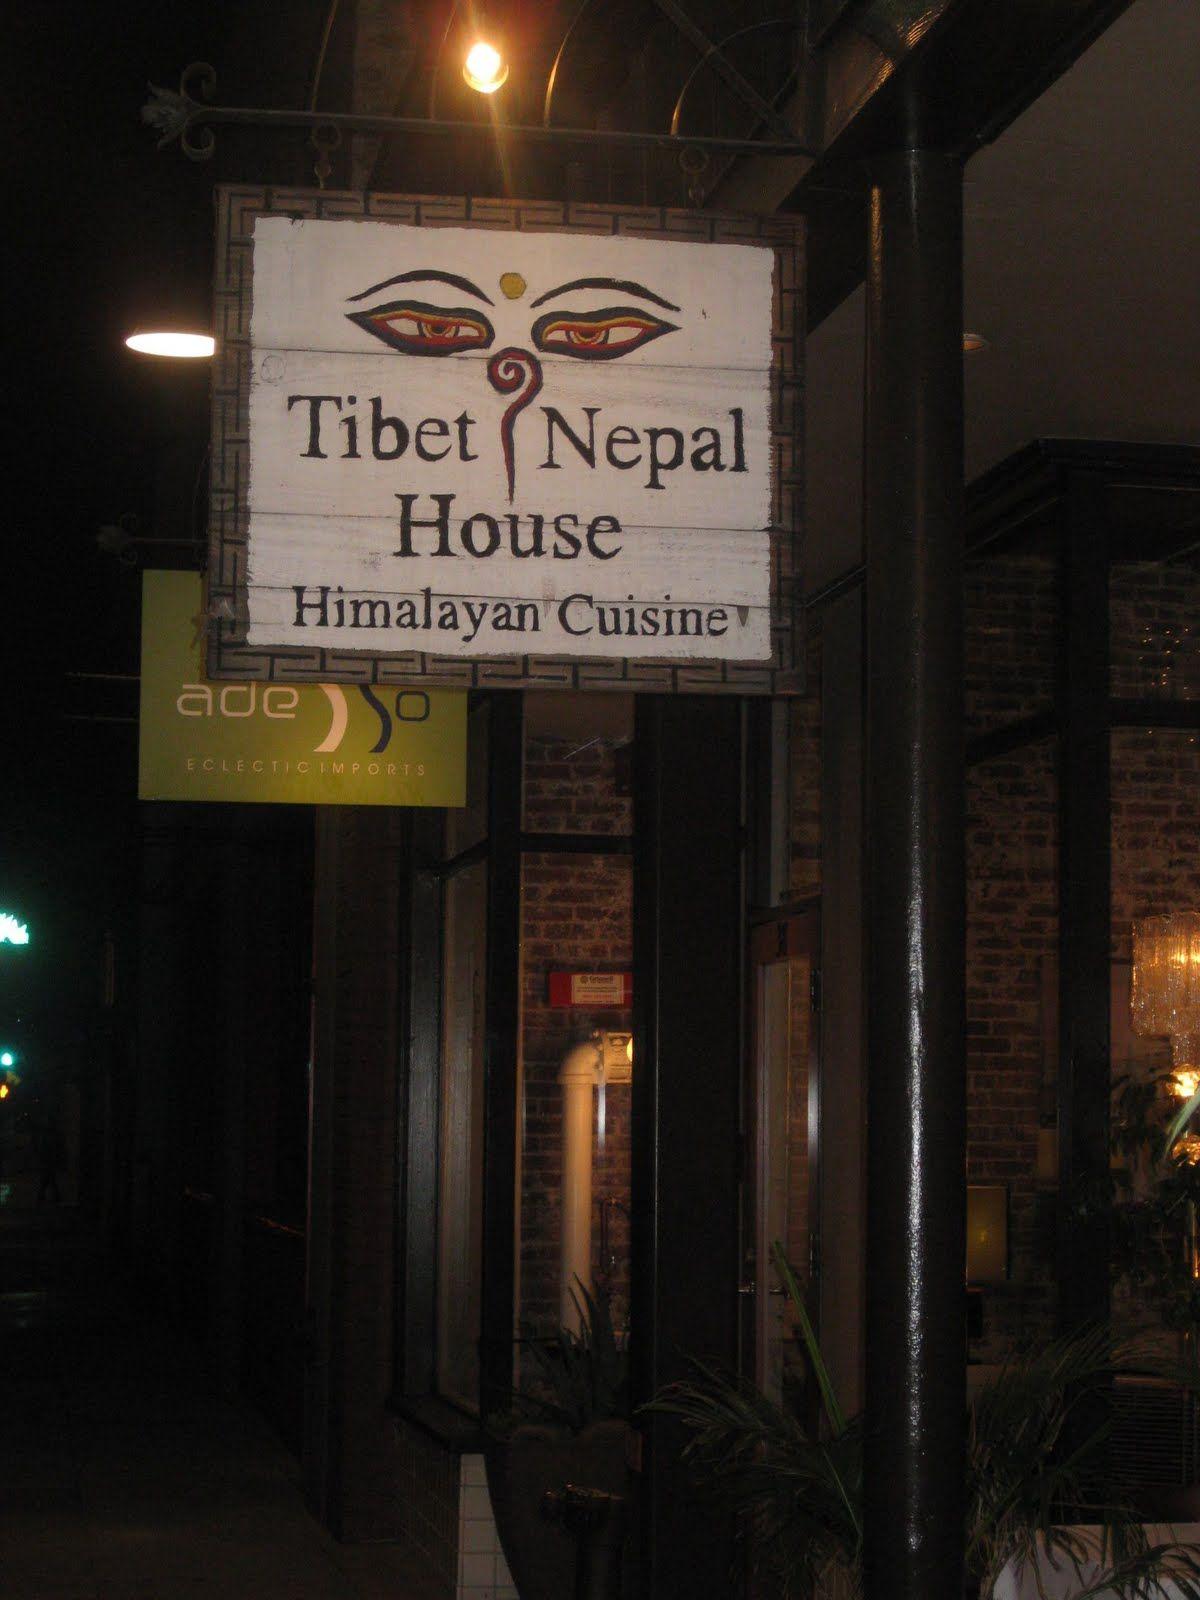 Tibet Nepal House, Pasadena